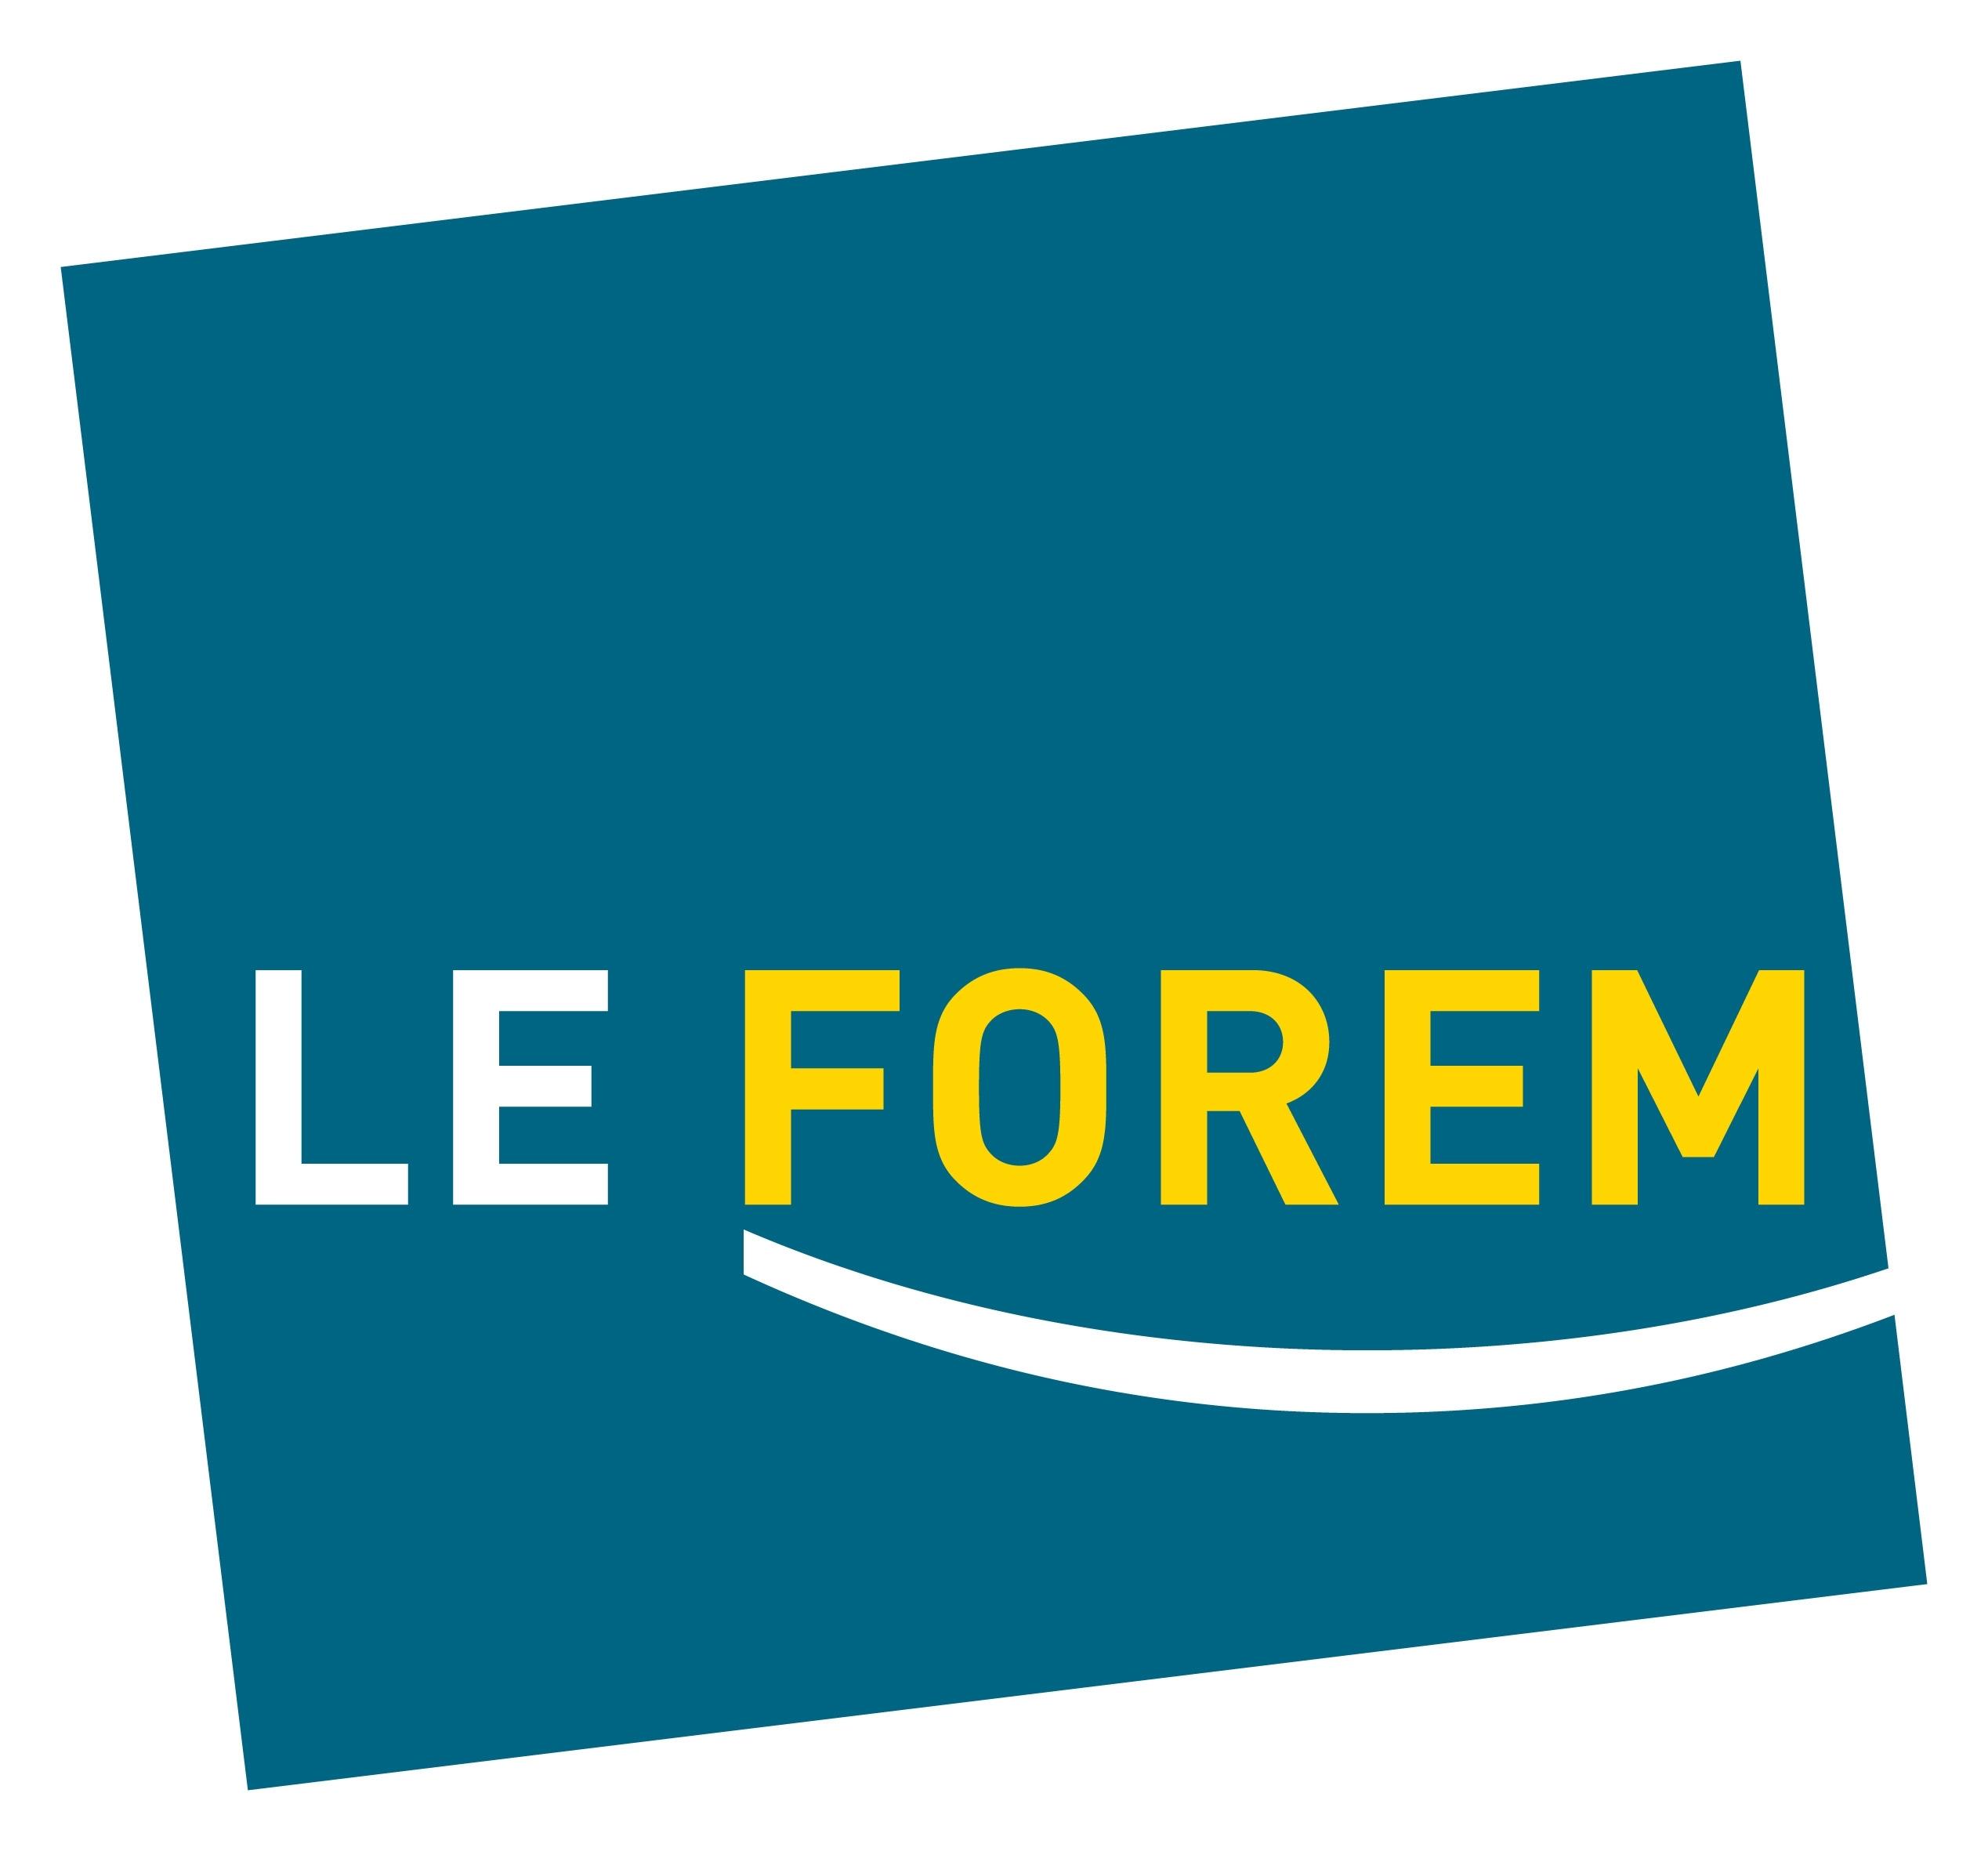 Le Forem, Belgio (coordinatore)